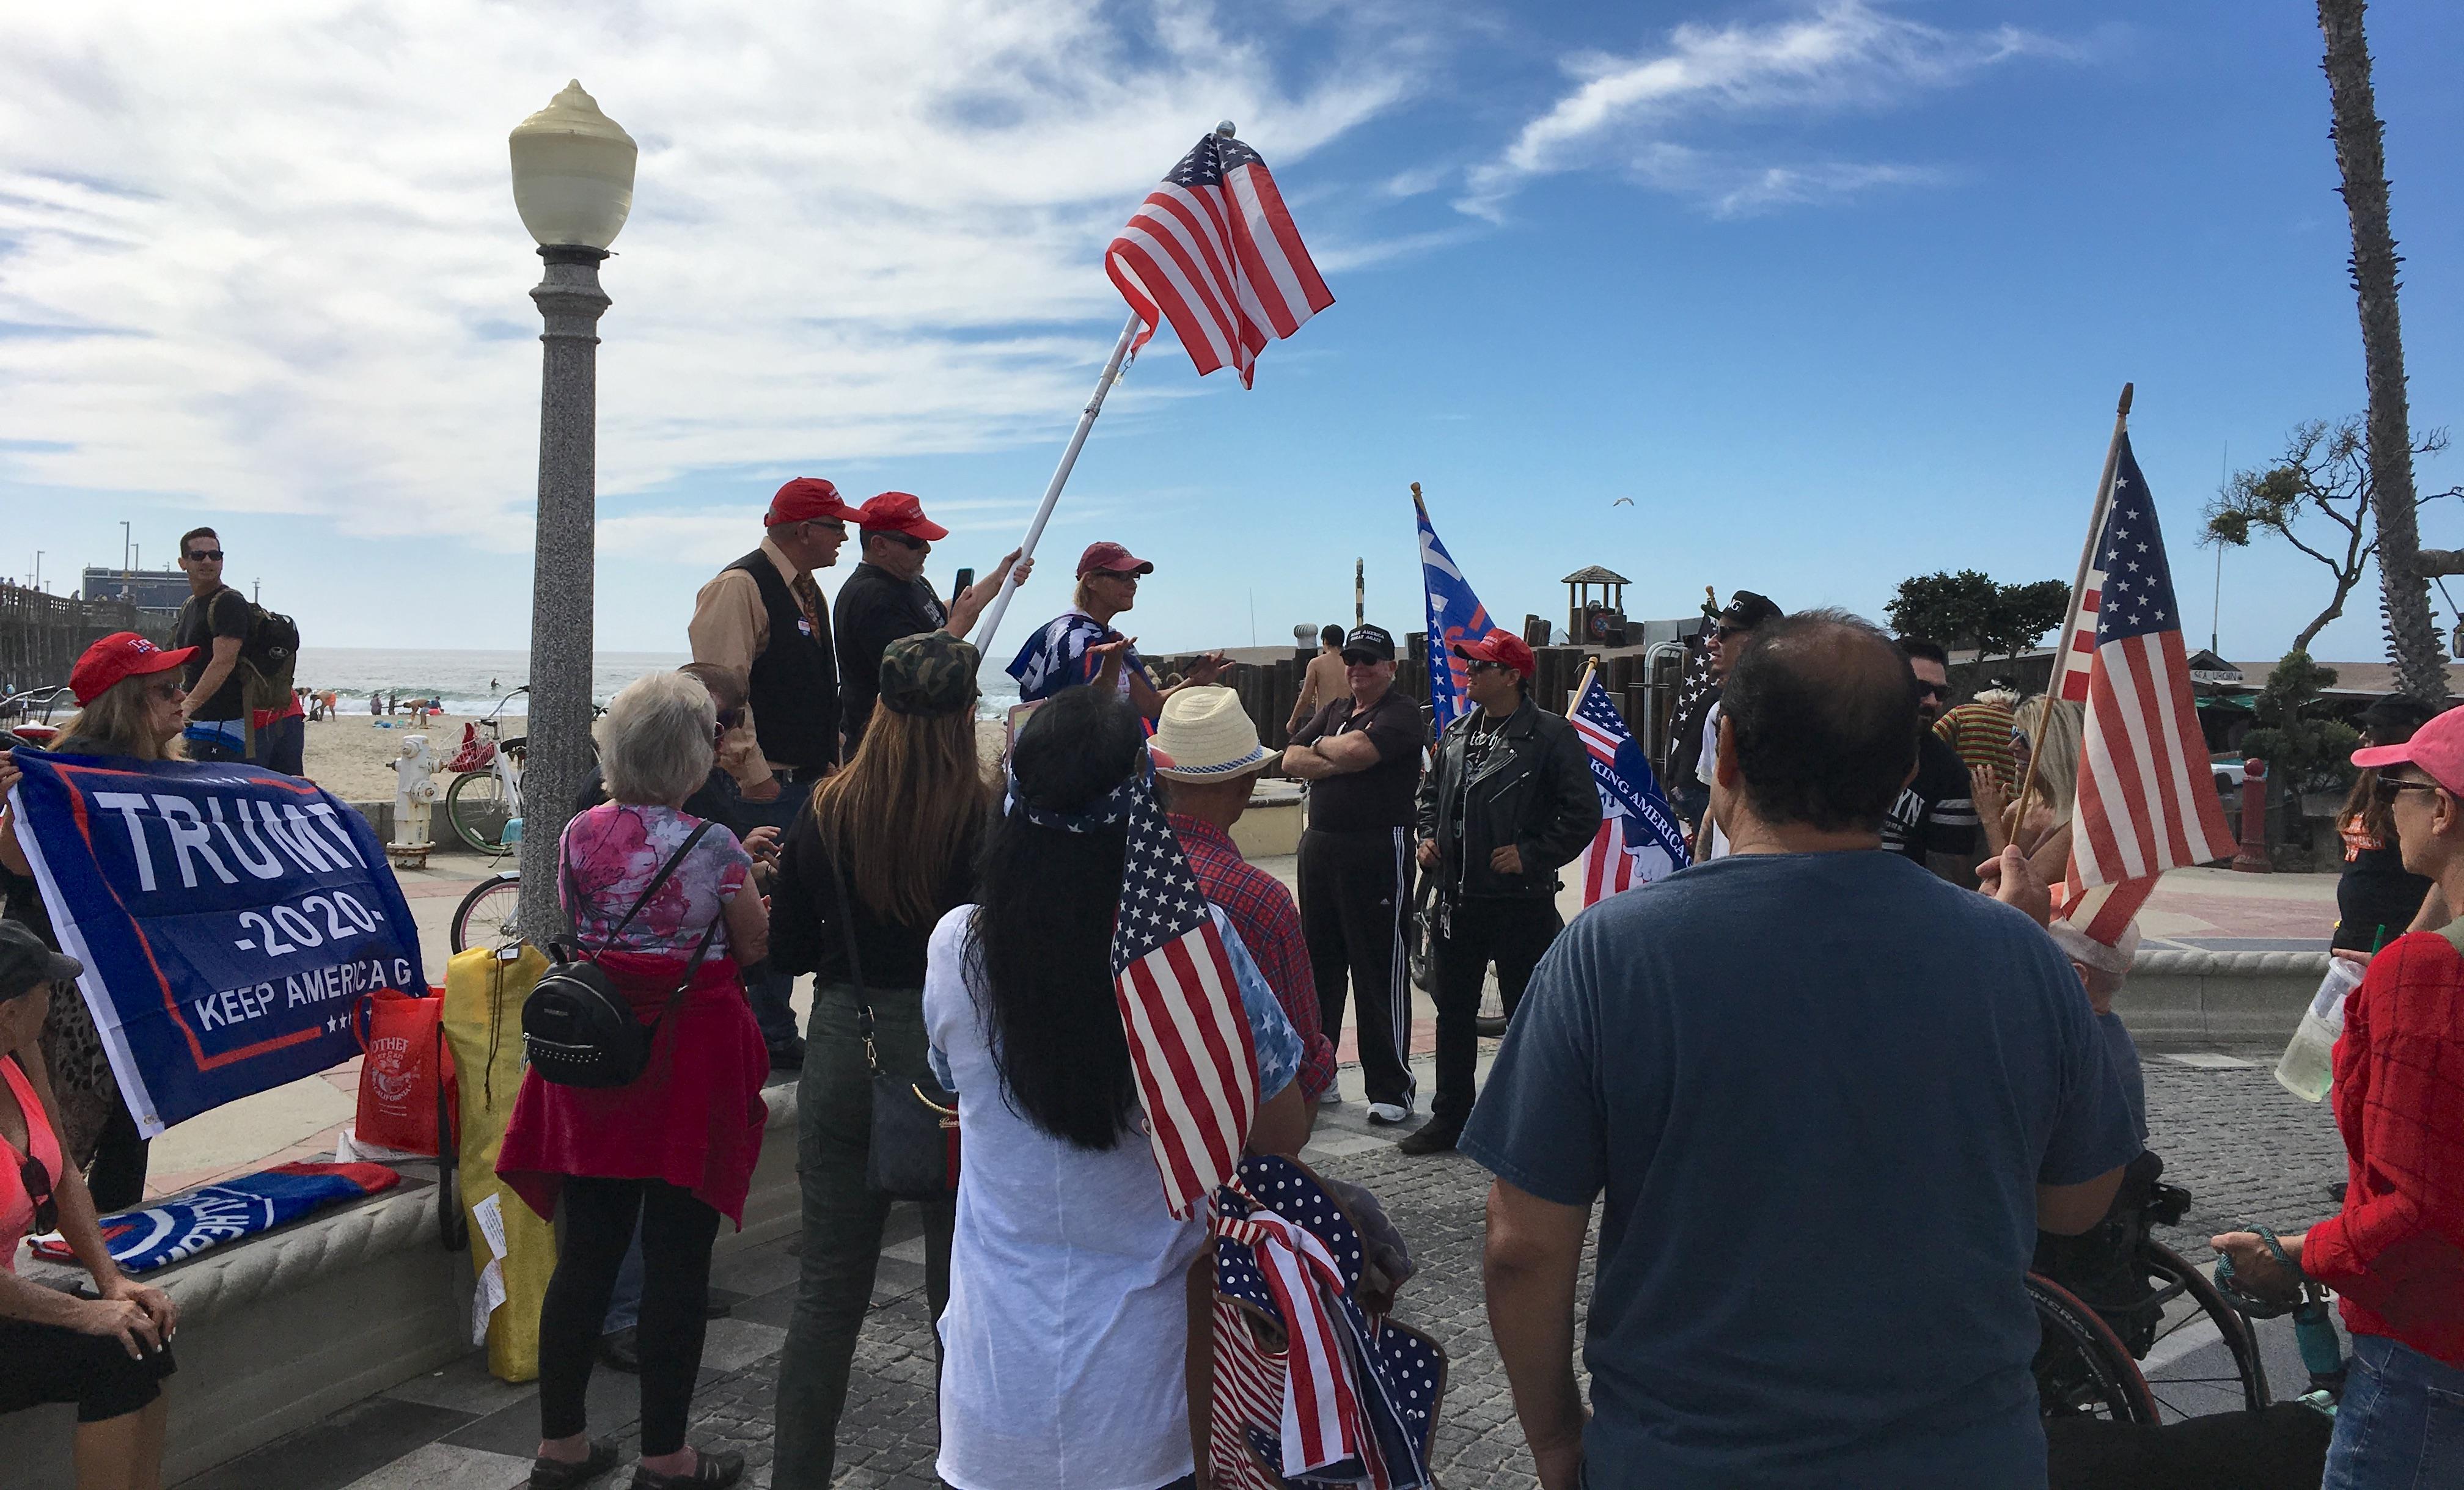 Newport Beach Trump Rally Inspires Civil Dialogue